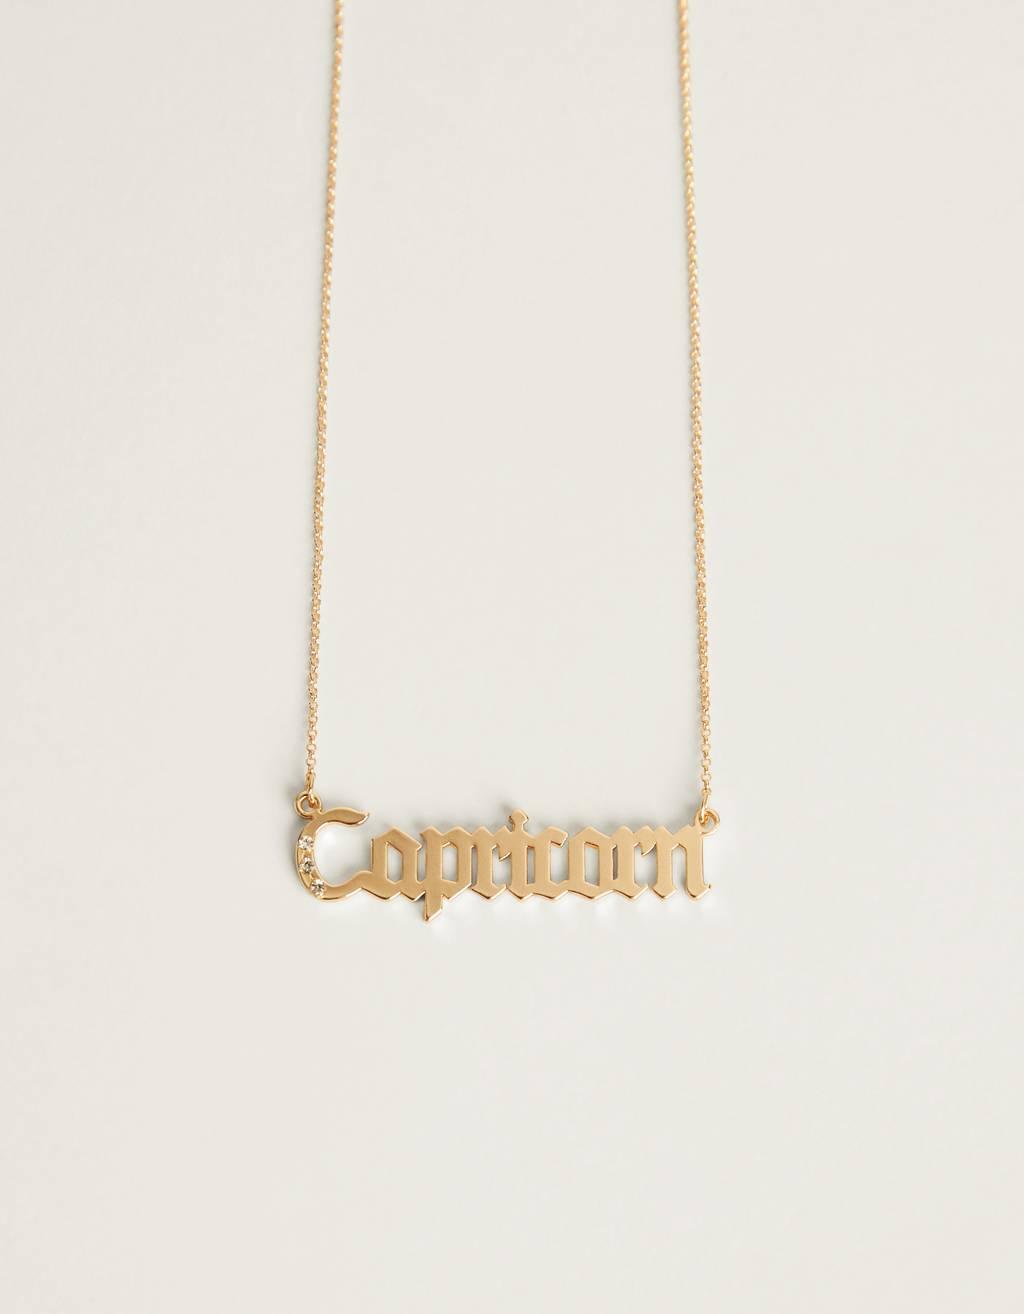 Collaret zodíac Capricorn